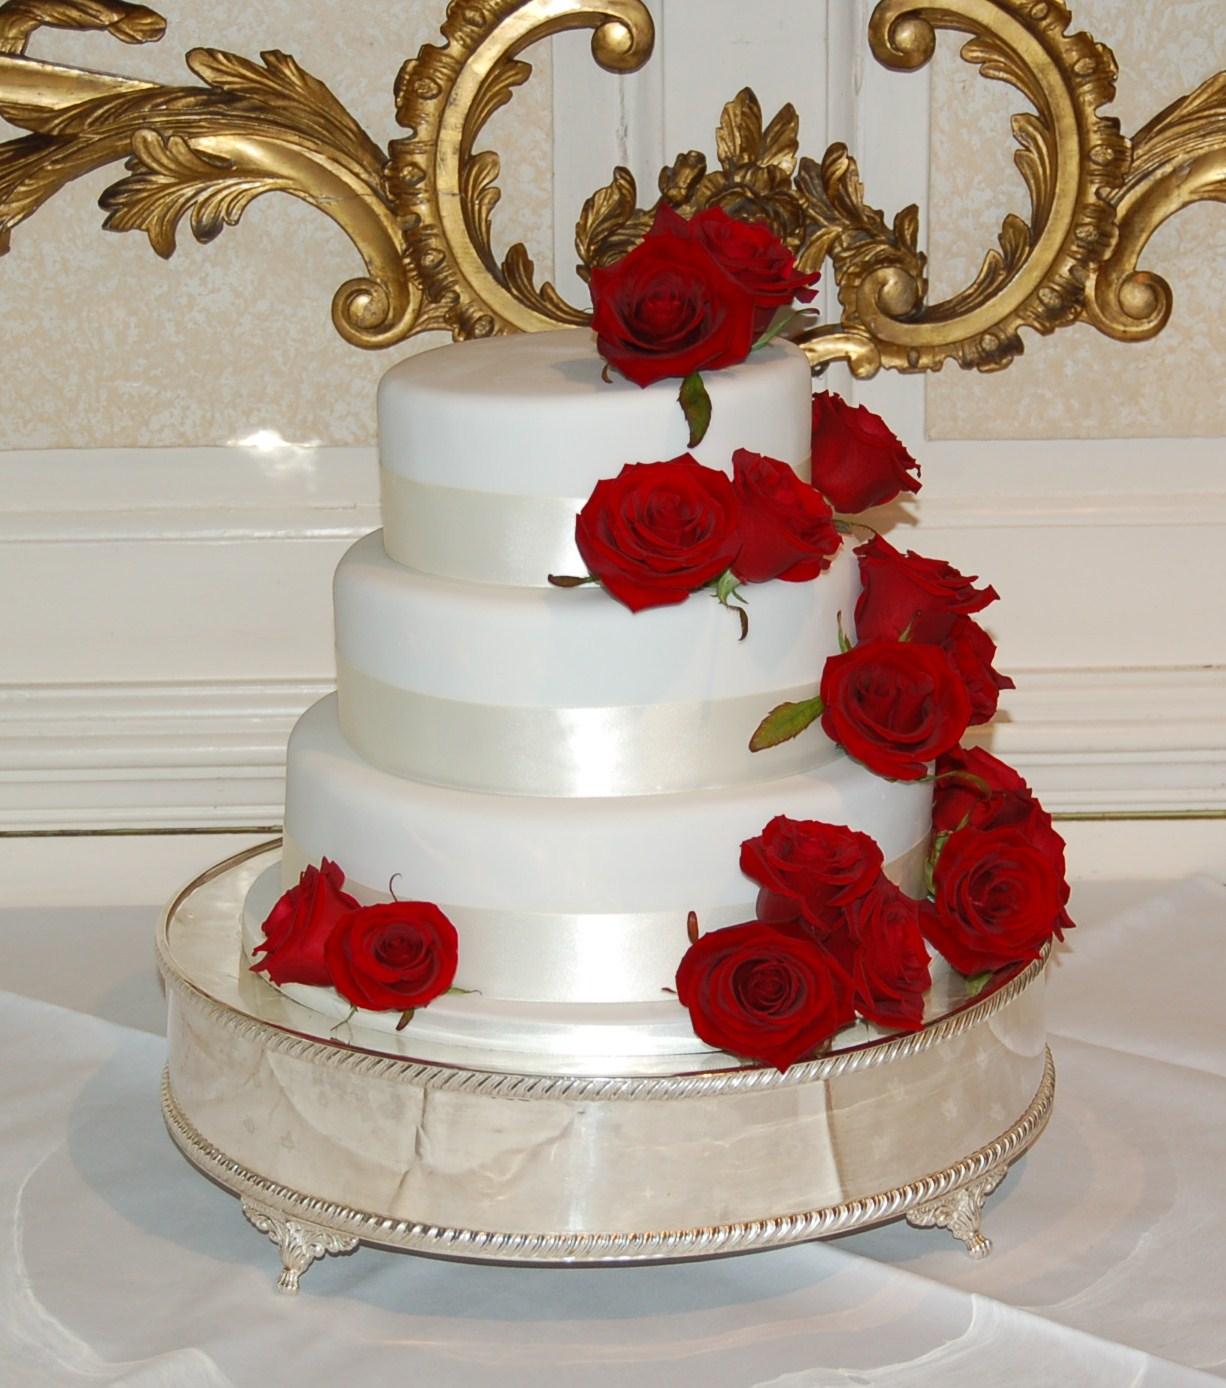 Rose Wedding Cake: Brighton Baker: March 2012